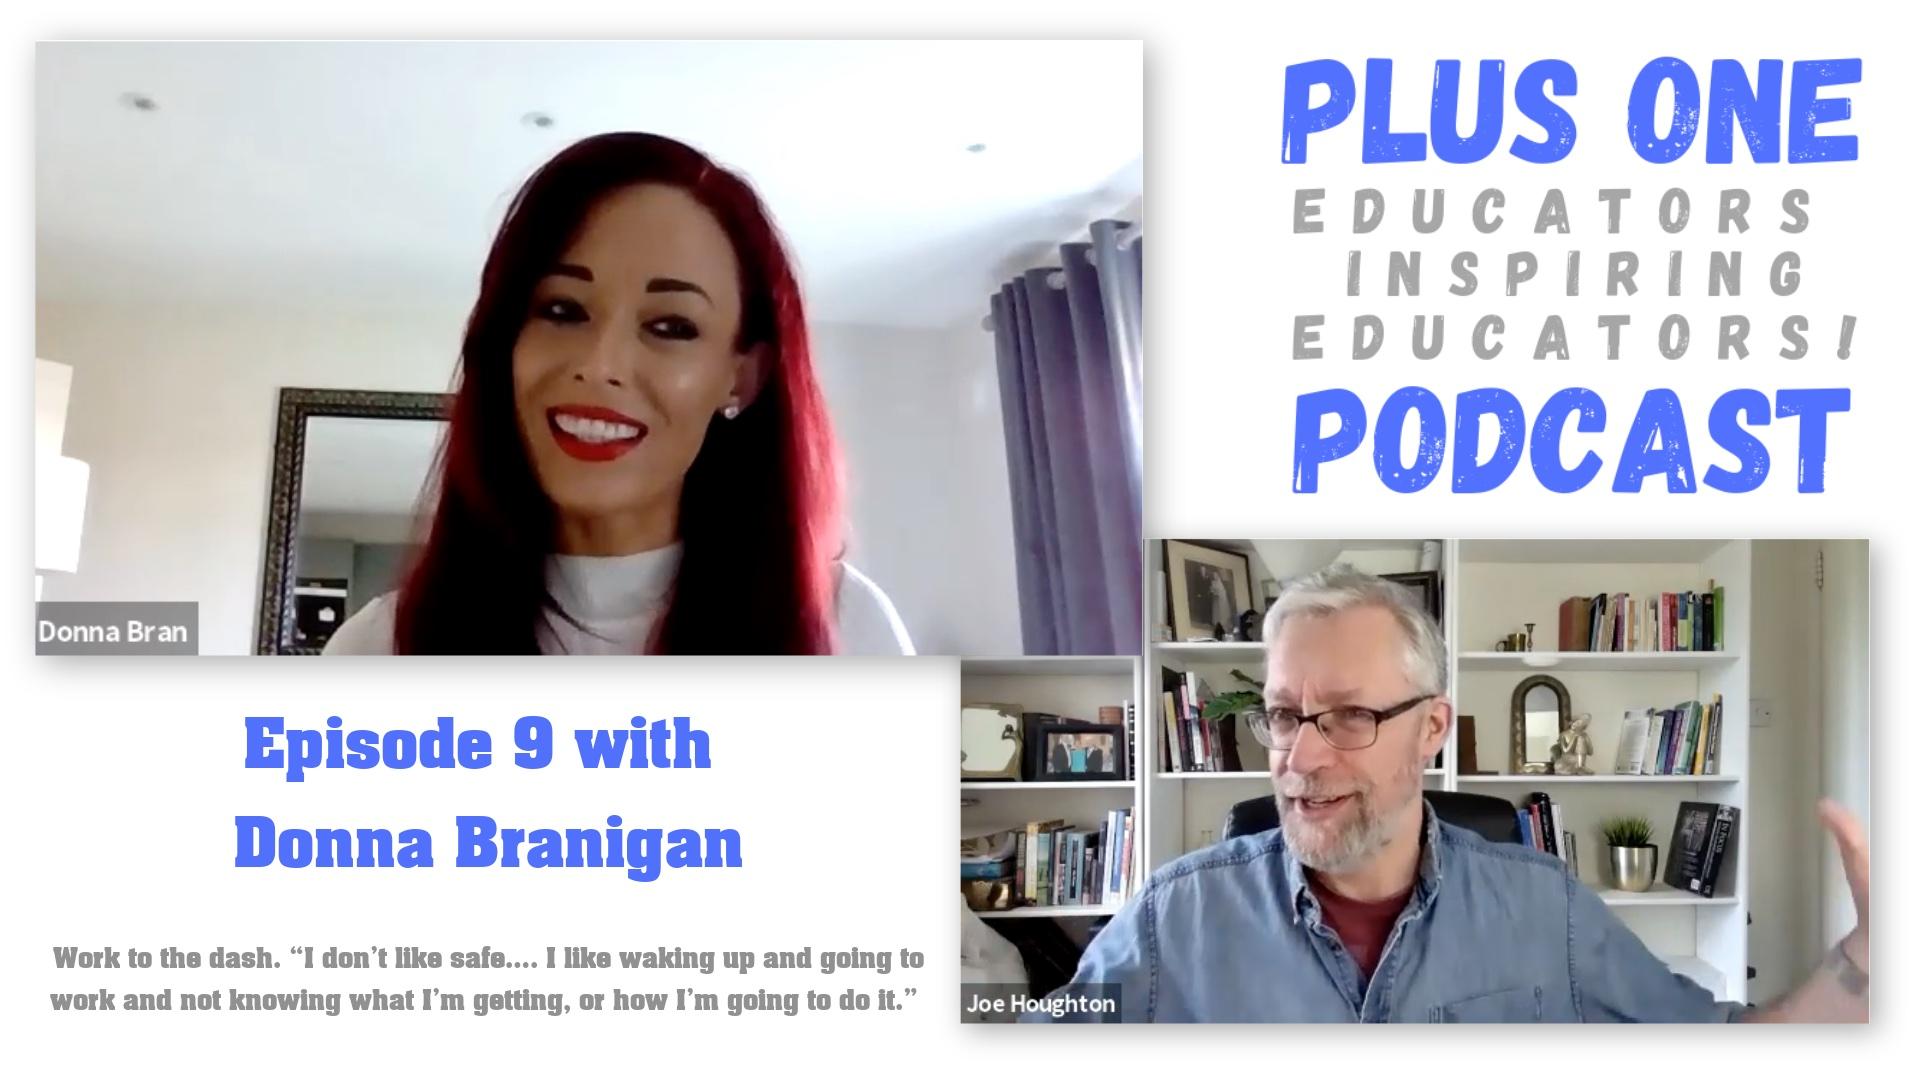 Episode 9 - Plus One Podcast - Donna Branigan